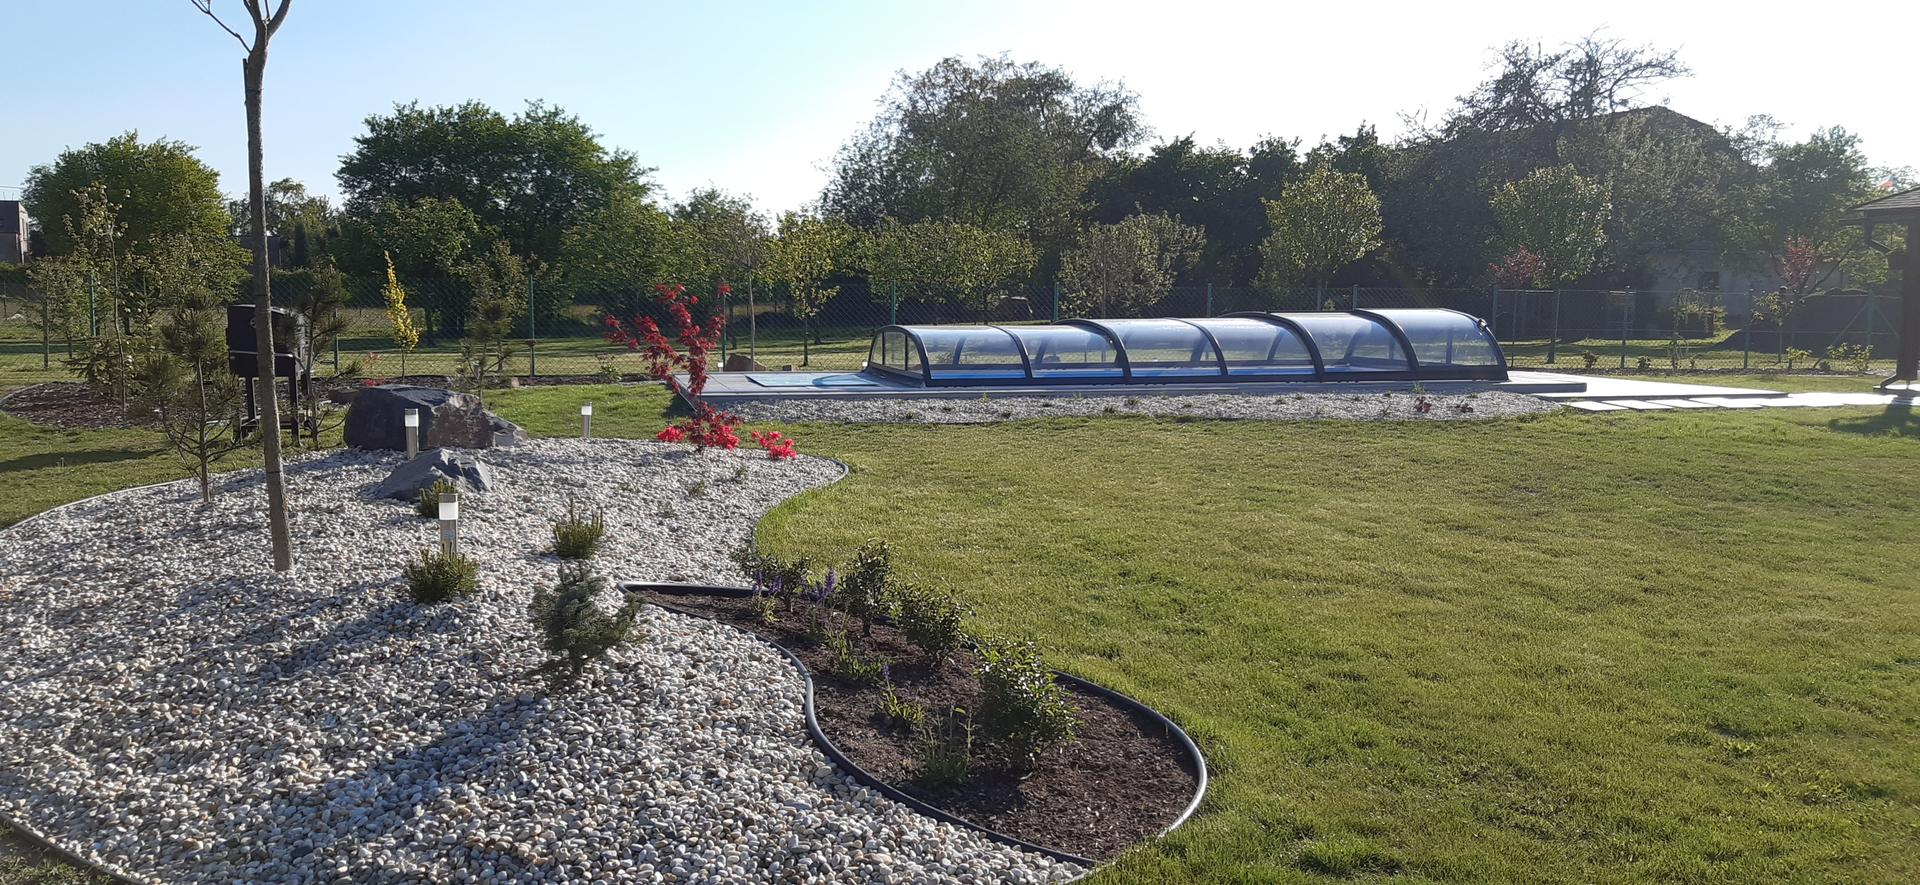 Zahrada 2020 - Obrázek č. 14